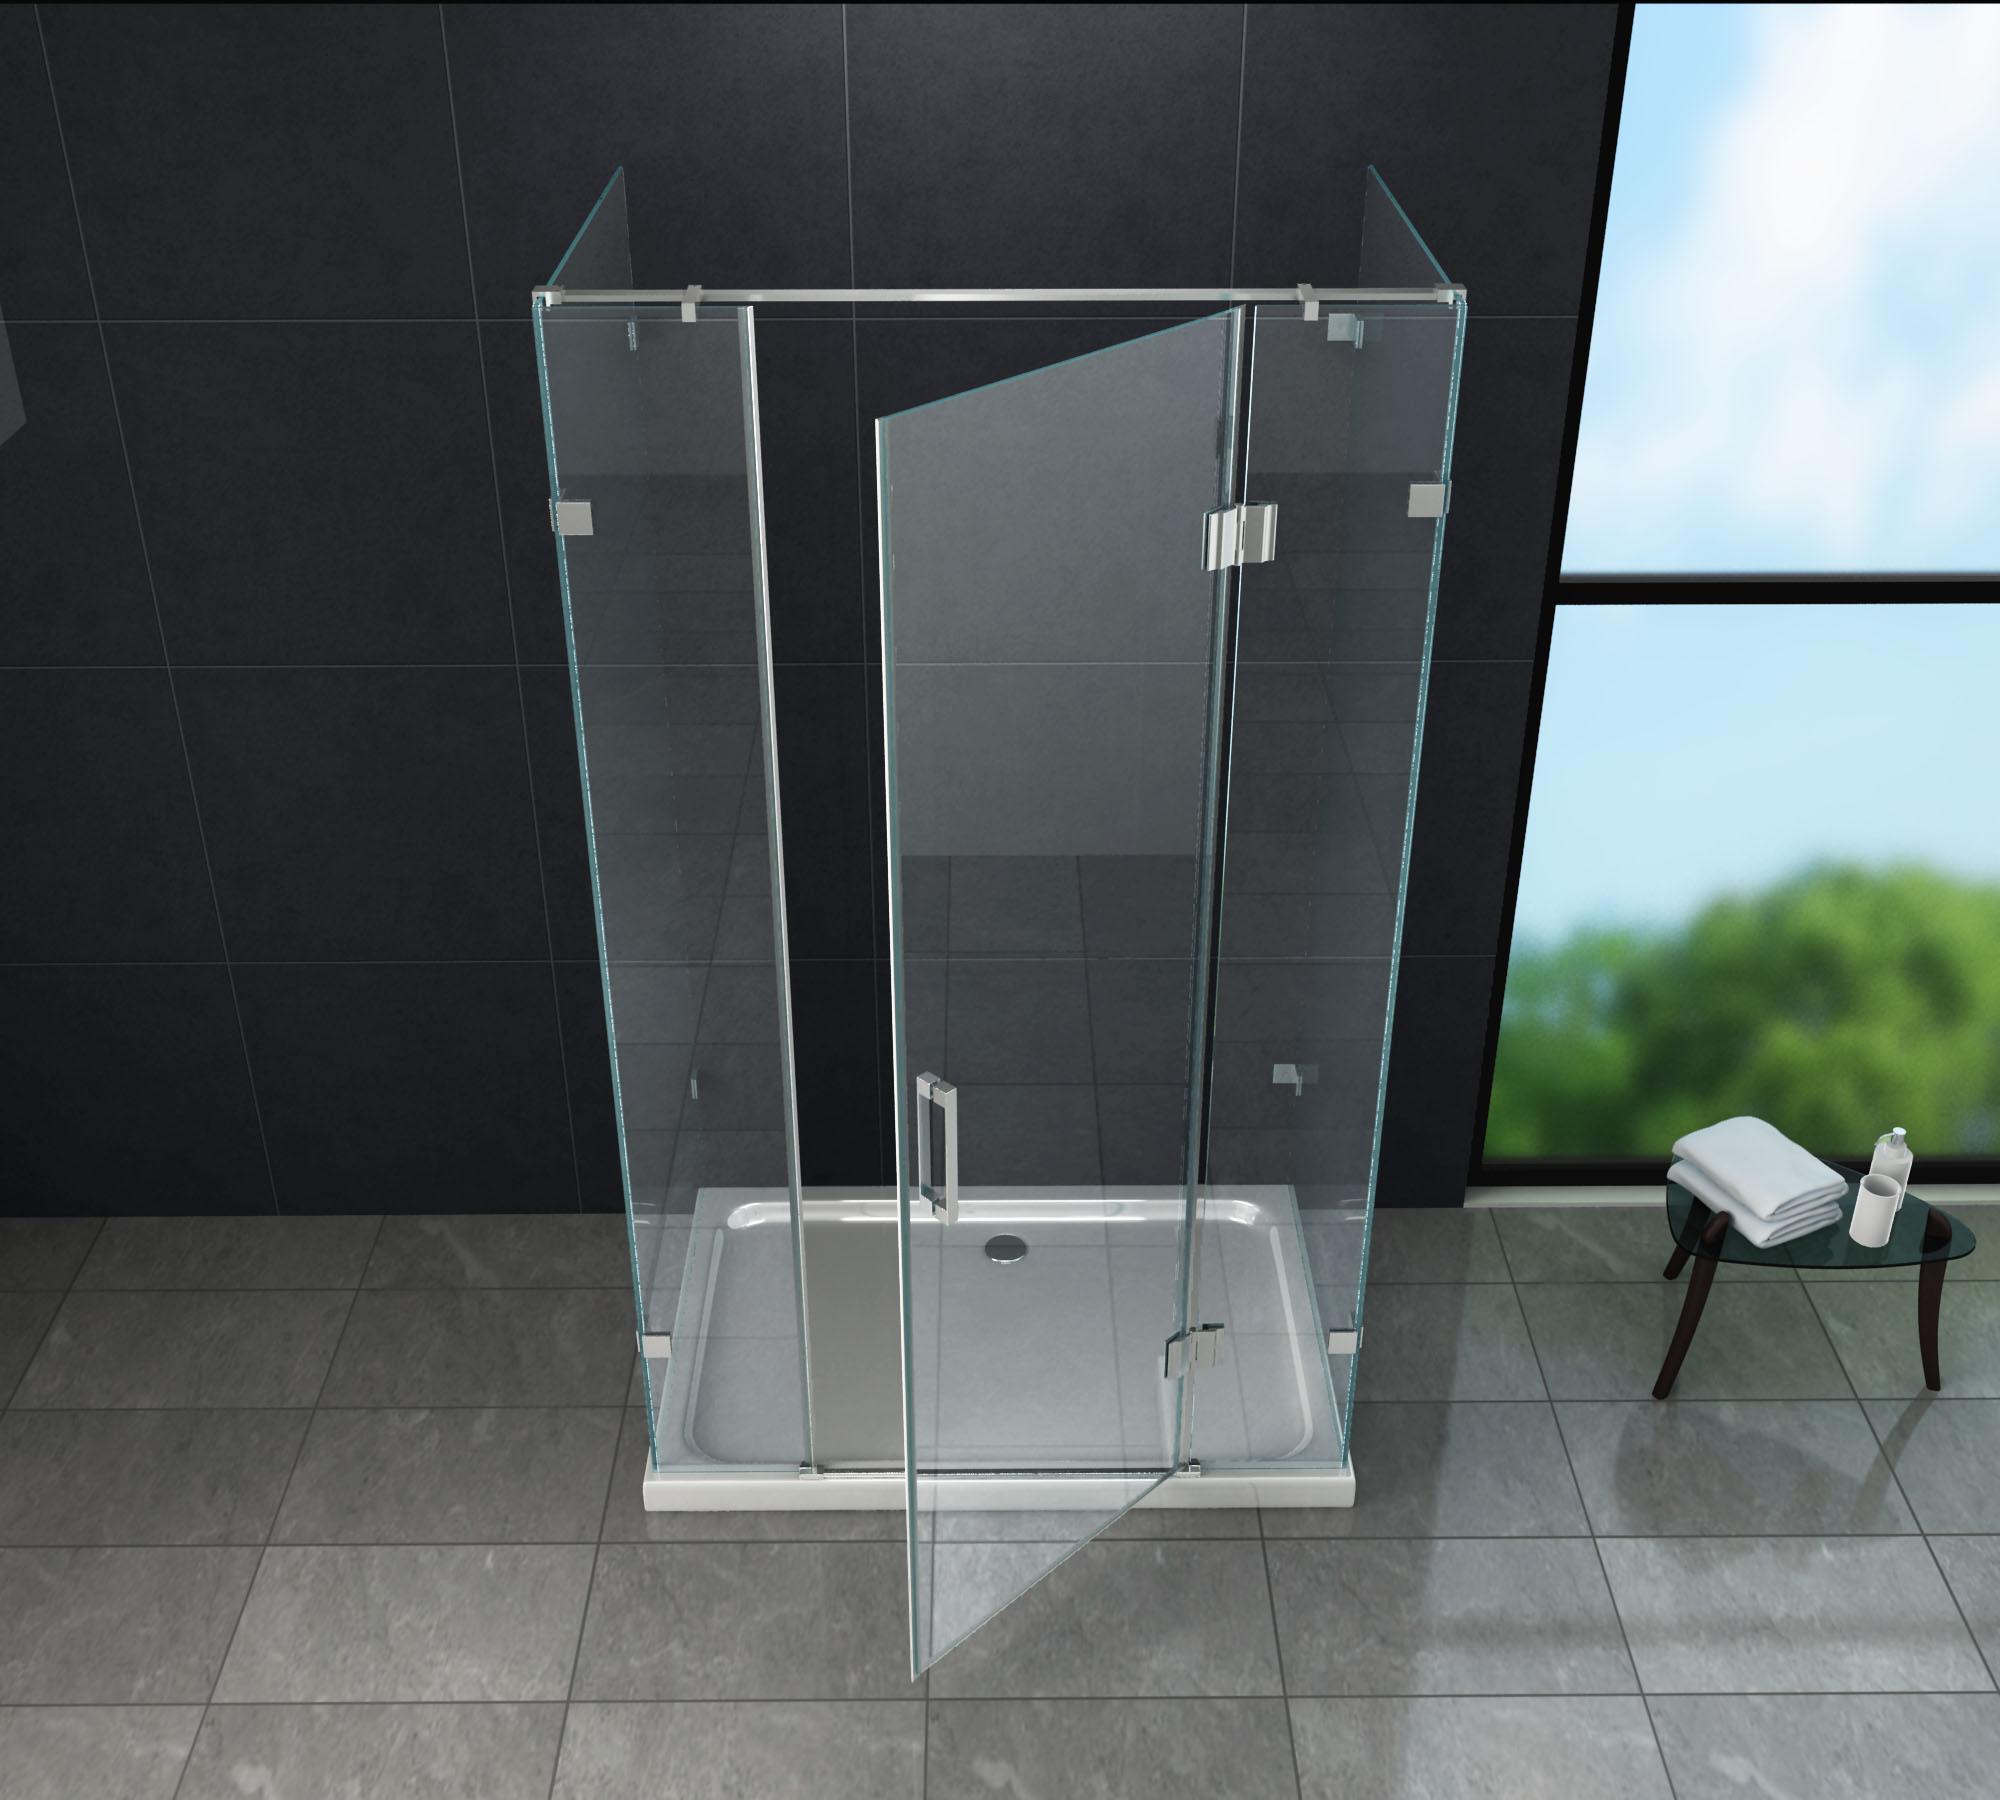 u duschkabine contorno 120 x 80 x 195 ohne duschtasse glasdeals. Black Bedroom Furniture Sets. Home Design Ideas